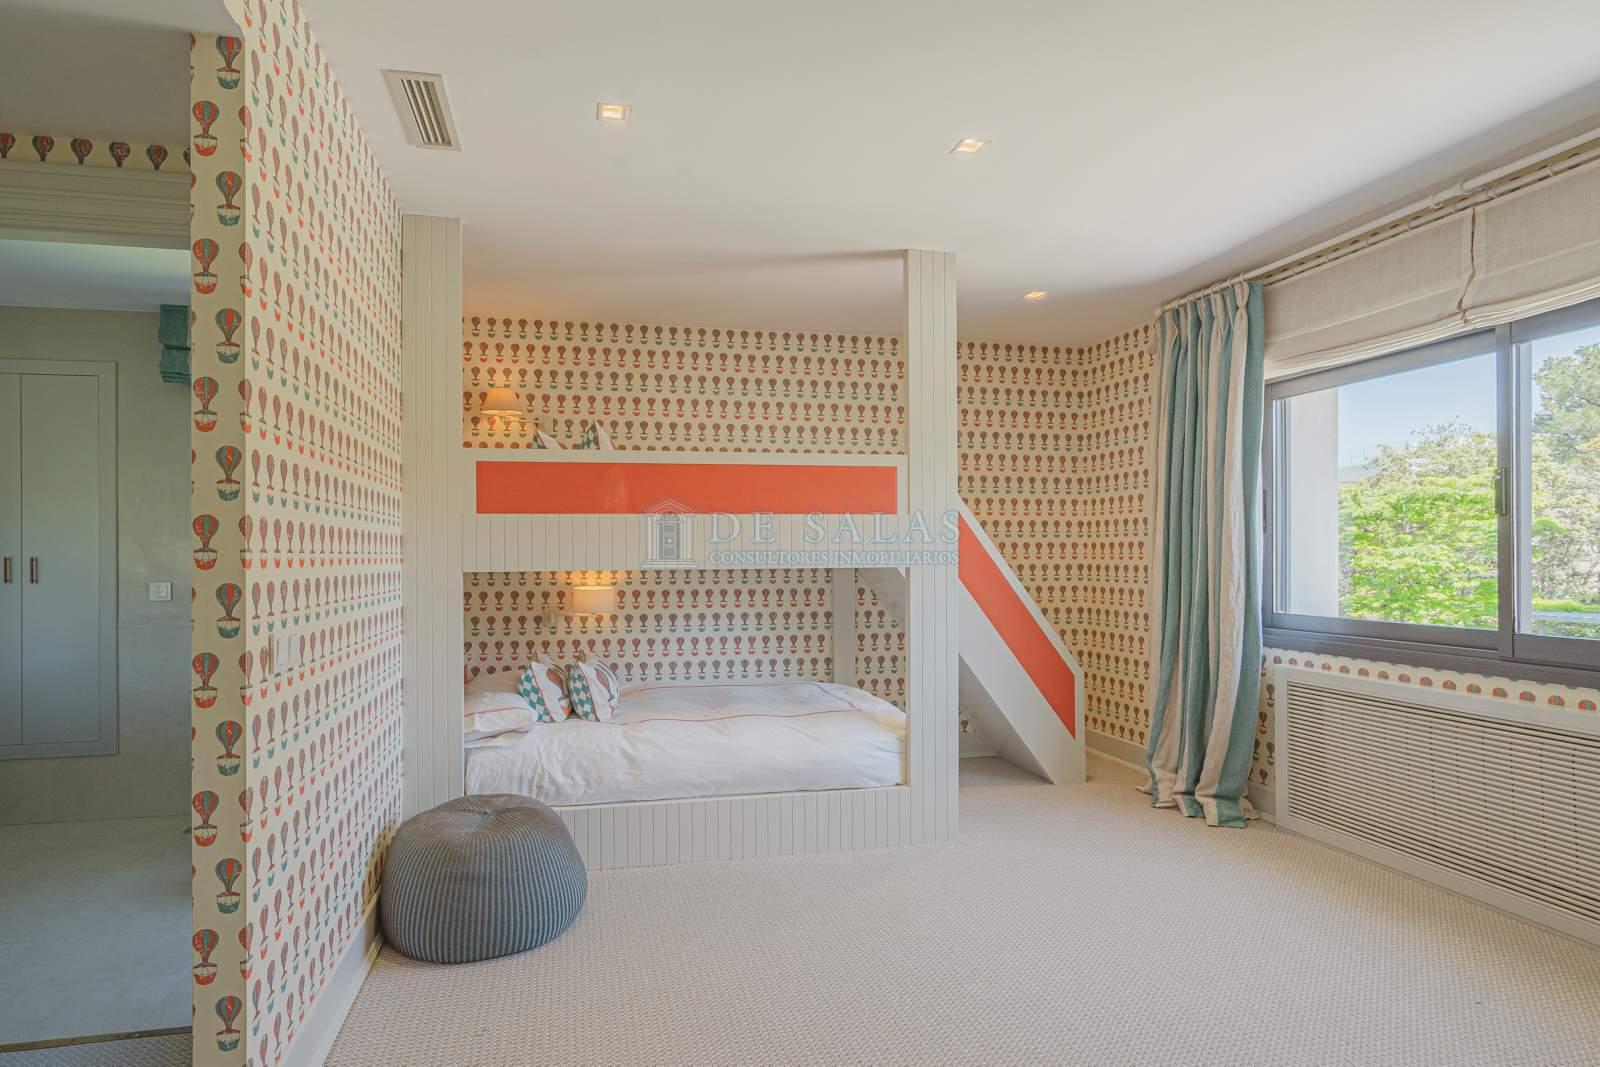 Dormitorio-0025 Chalet La Moraleja